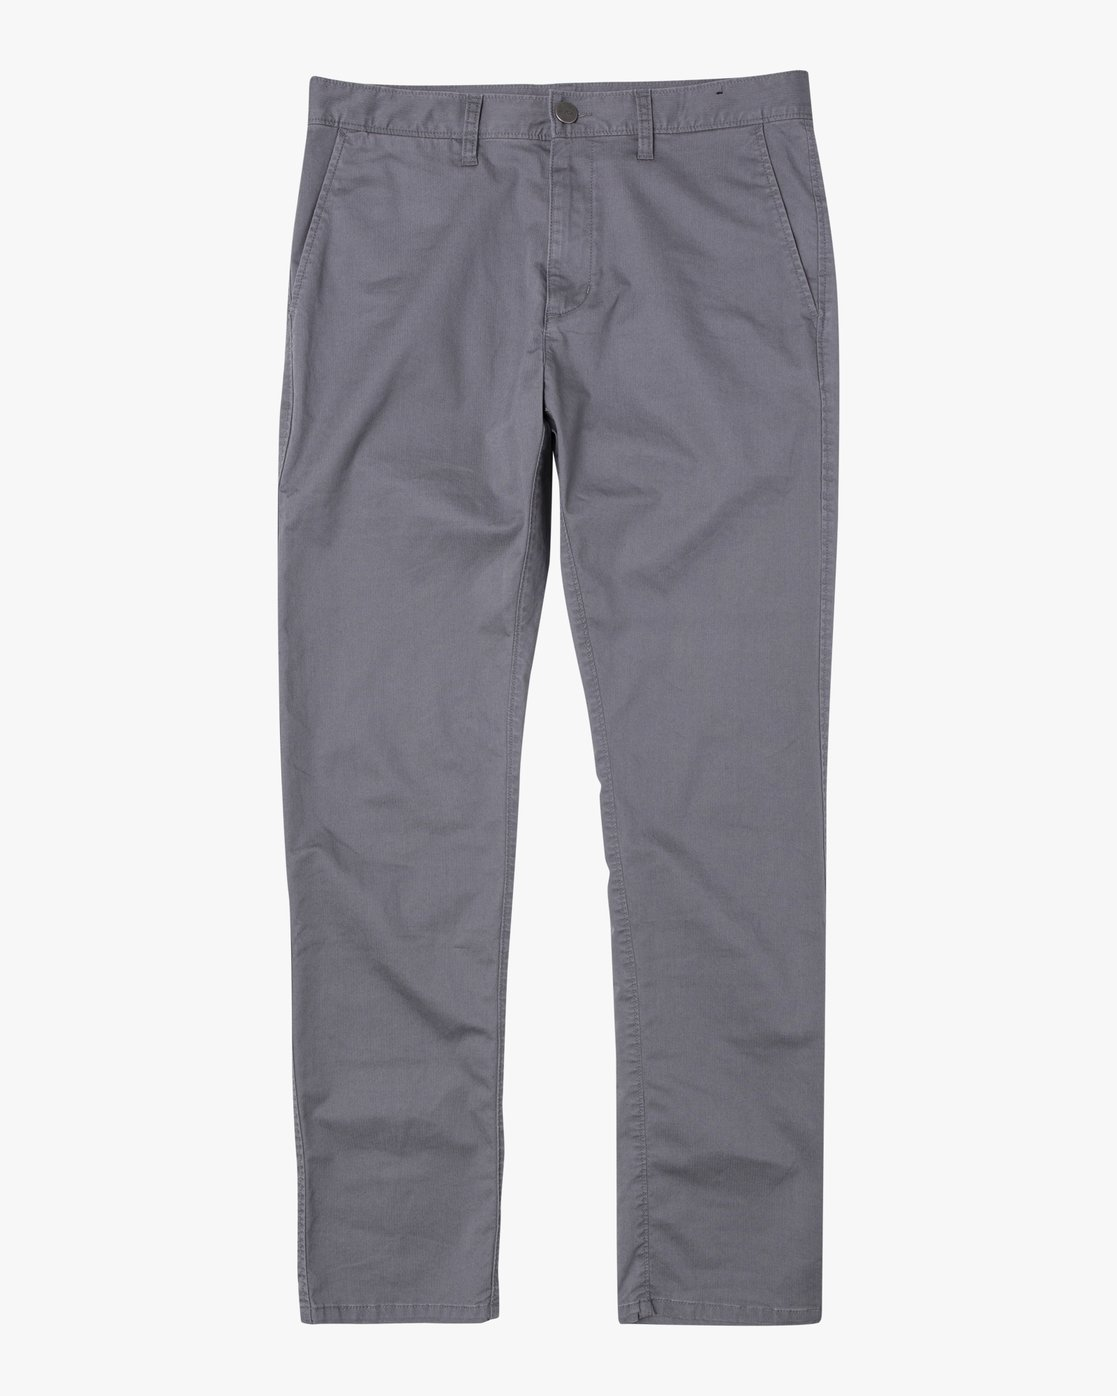 1 DAGGERS SLIM FIT CHINO pant Grey M3443RDC RVCA